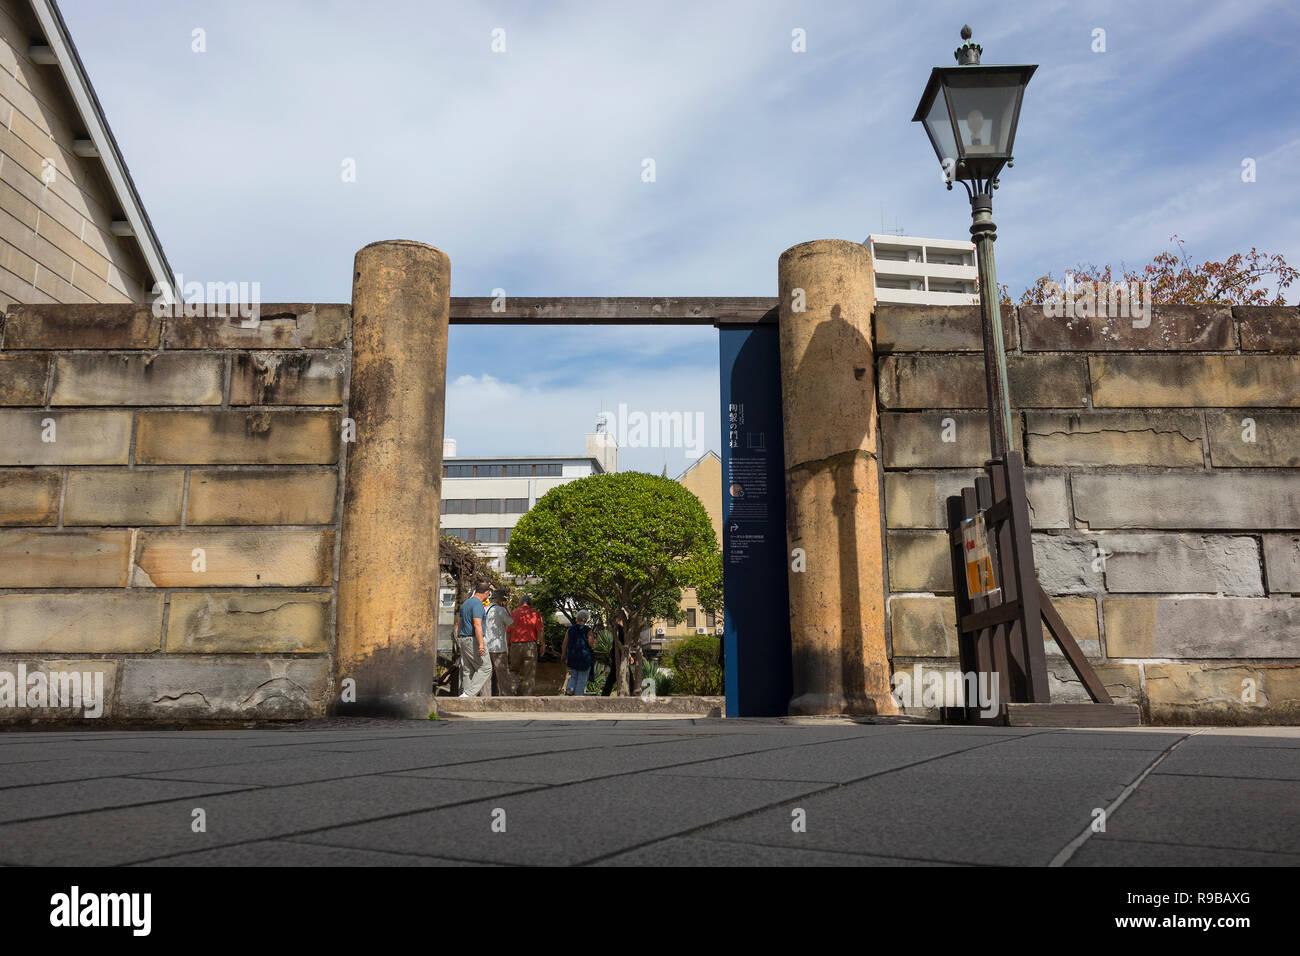 Nagasaki, Japan - October 22, 2018: Entrance to the garden in of the reconstructed buildings in Dejima, Nagasaki - Stock Image